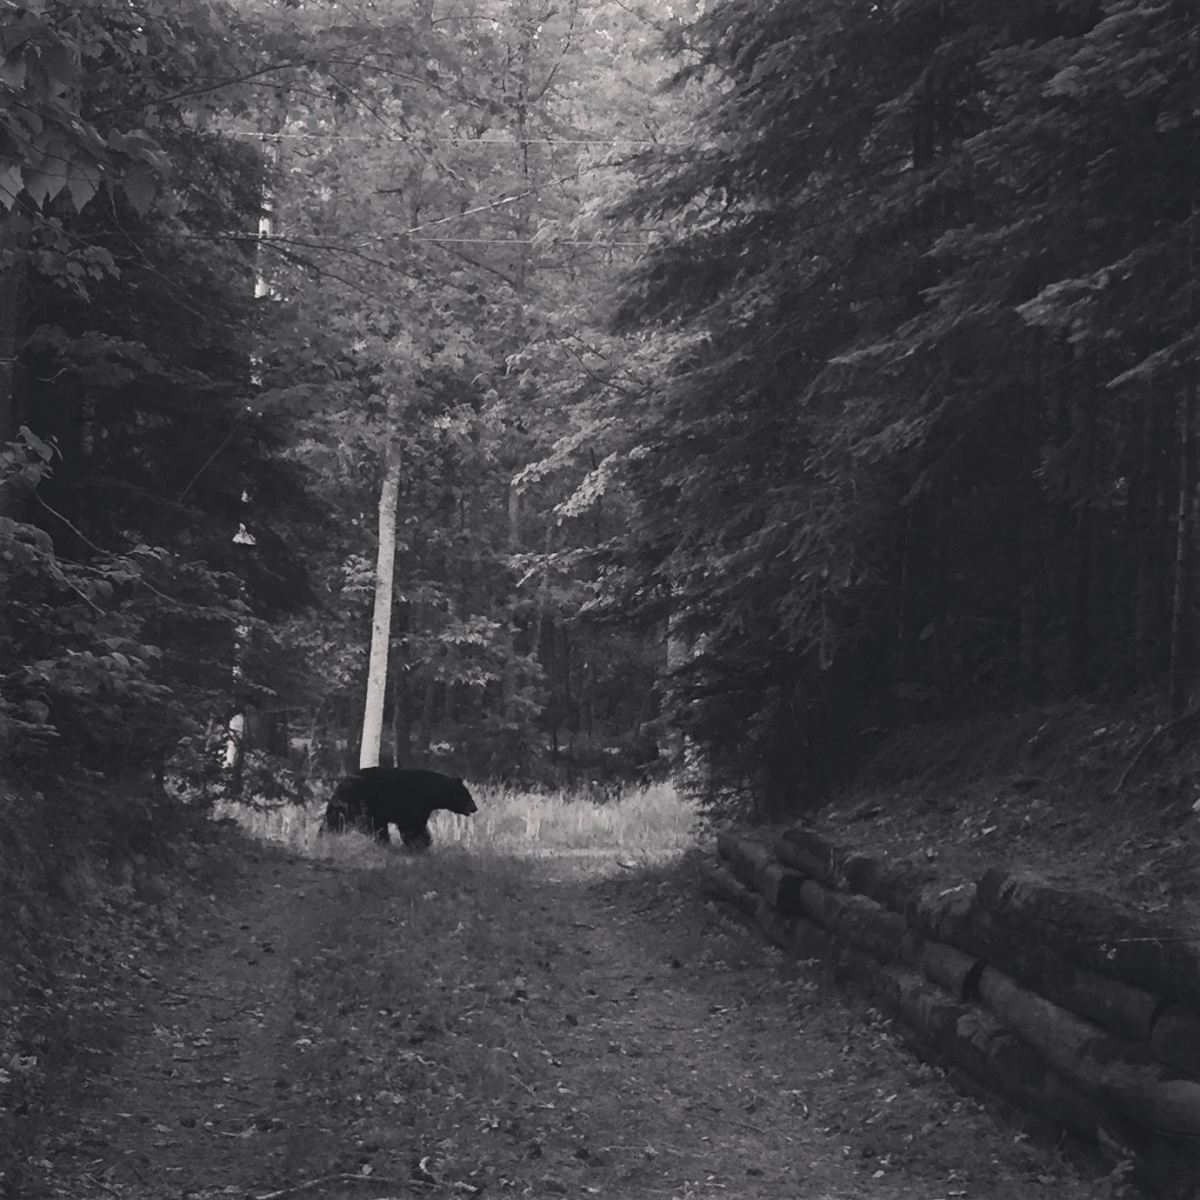 A black bear roams a cabin road in northern Minnesota.